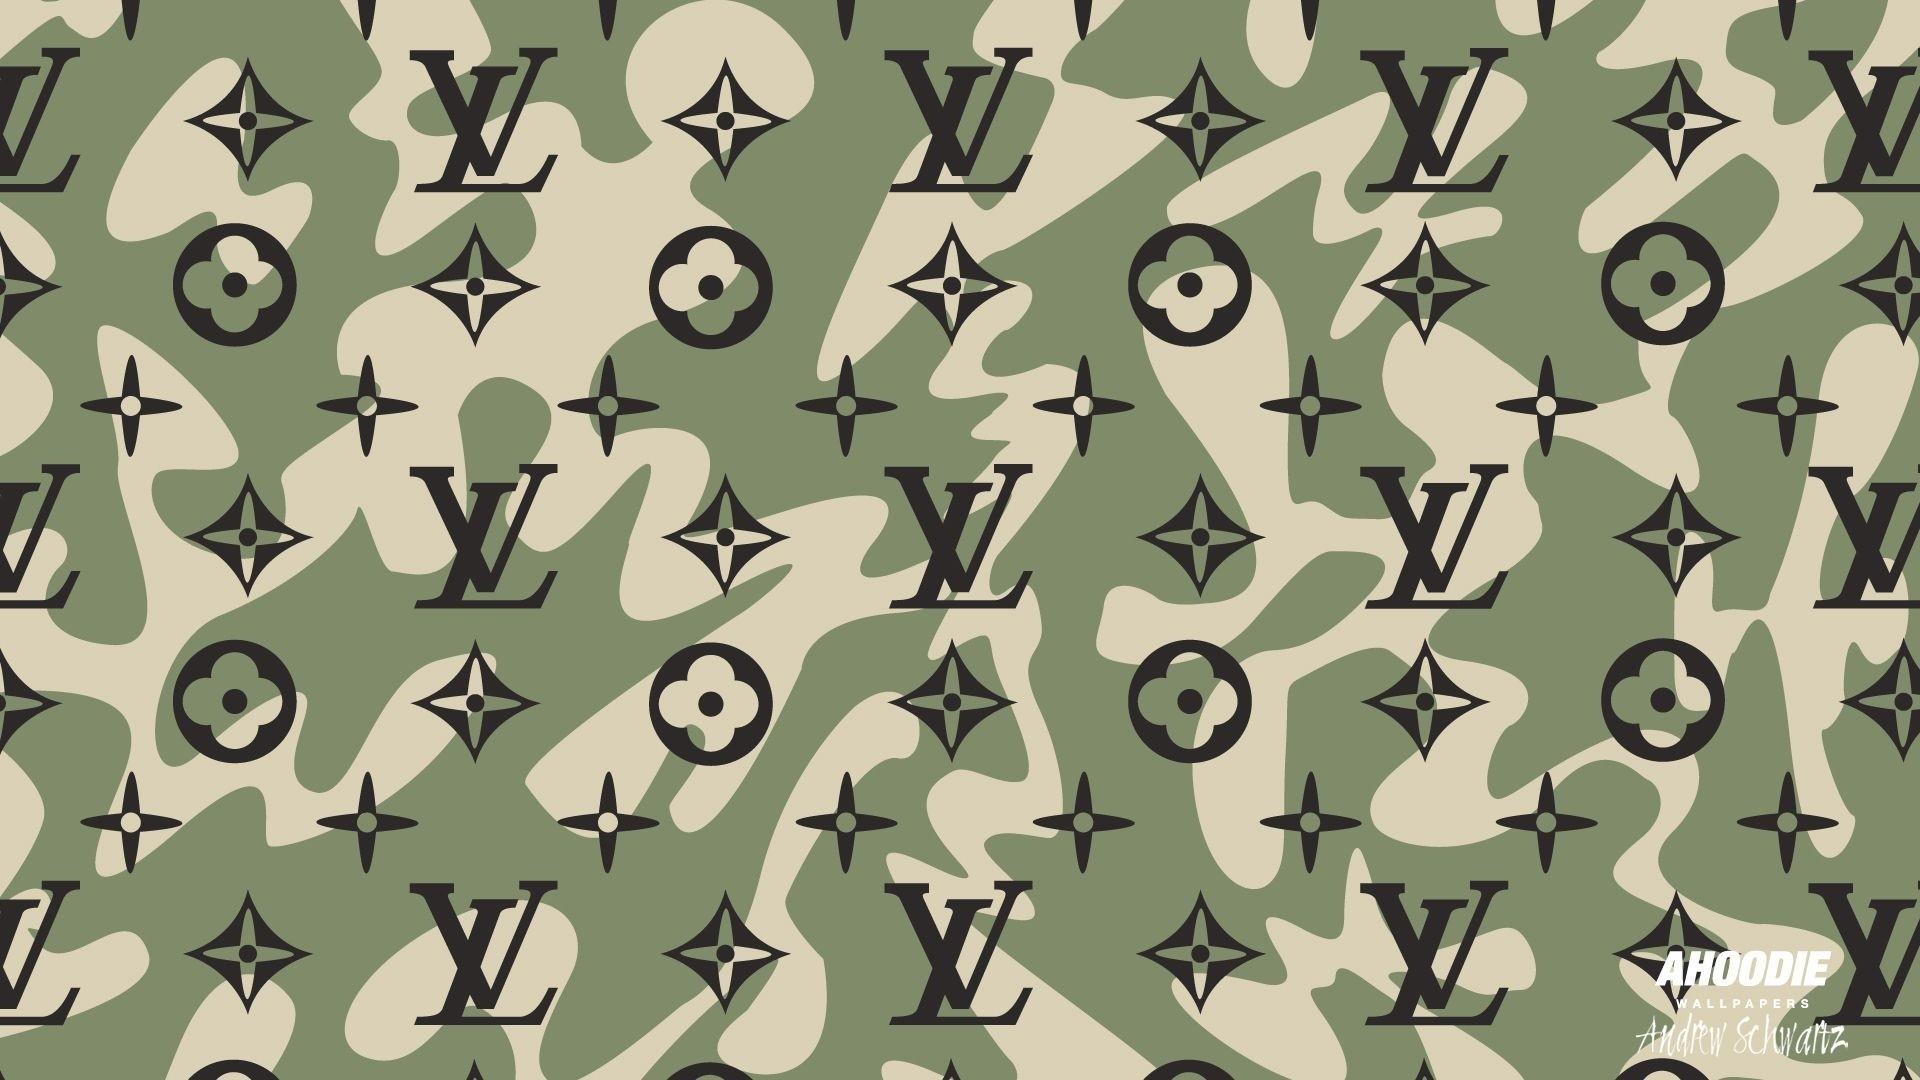 Louis Vuitton Wallpaper Iphone 8 Ahoy Comics